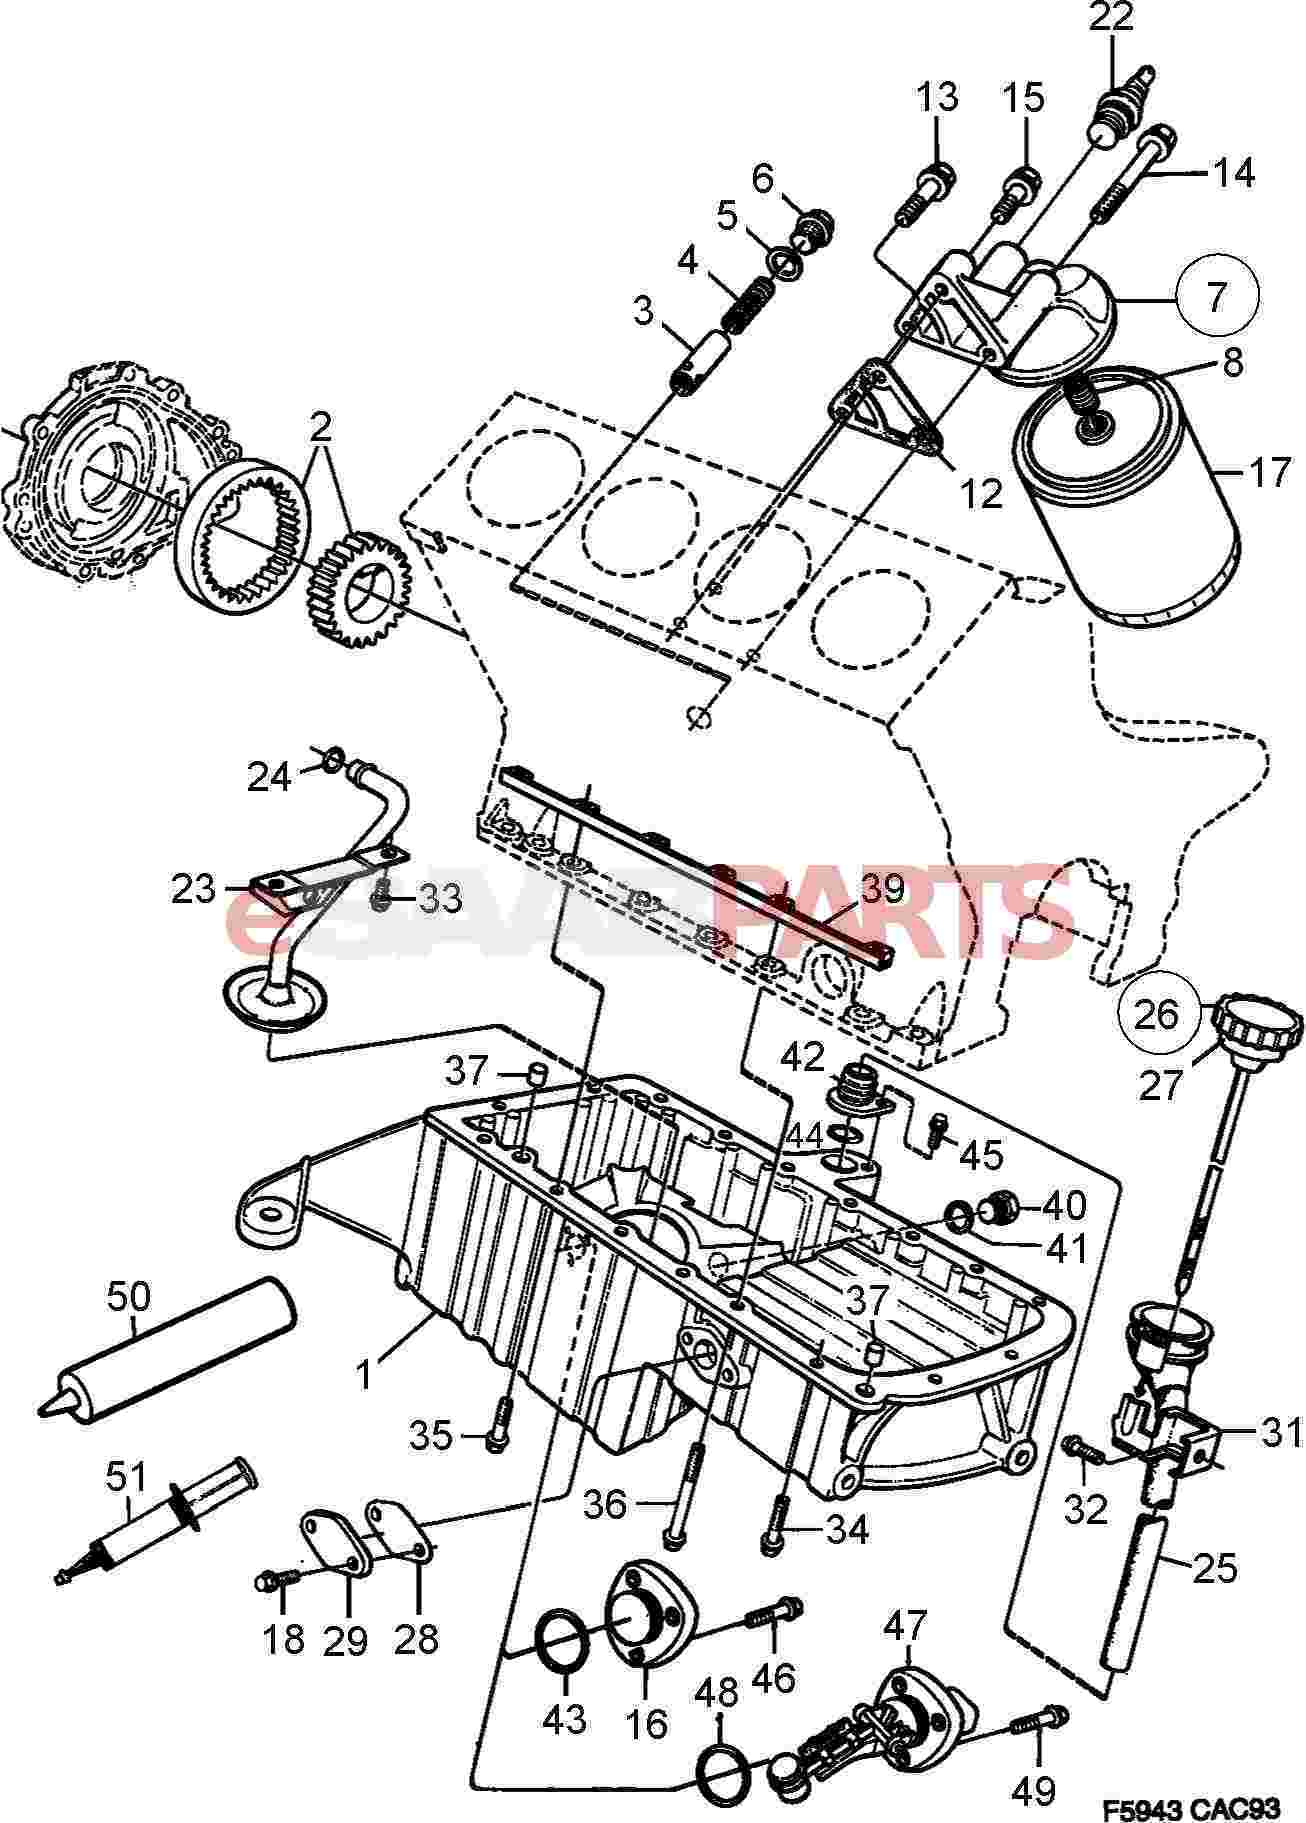 Saab Oil Diagram Data Circuit 4400 Wiring Likewise Leece Neville Alternator Line Trusted U2022 Rh Soulmatestyle Co Pumps Life Well